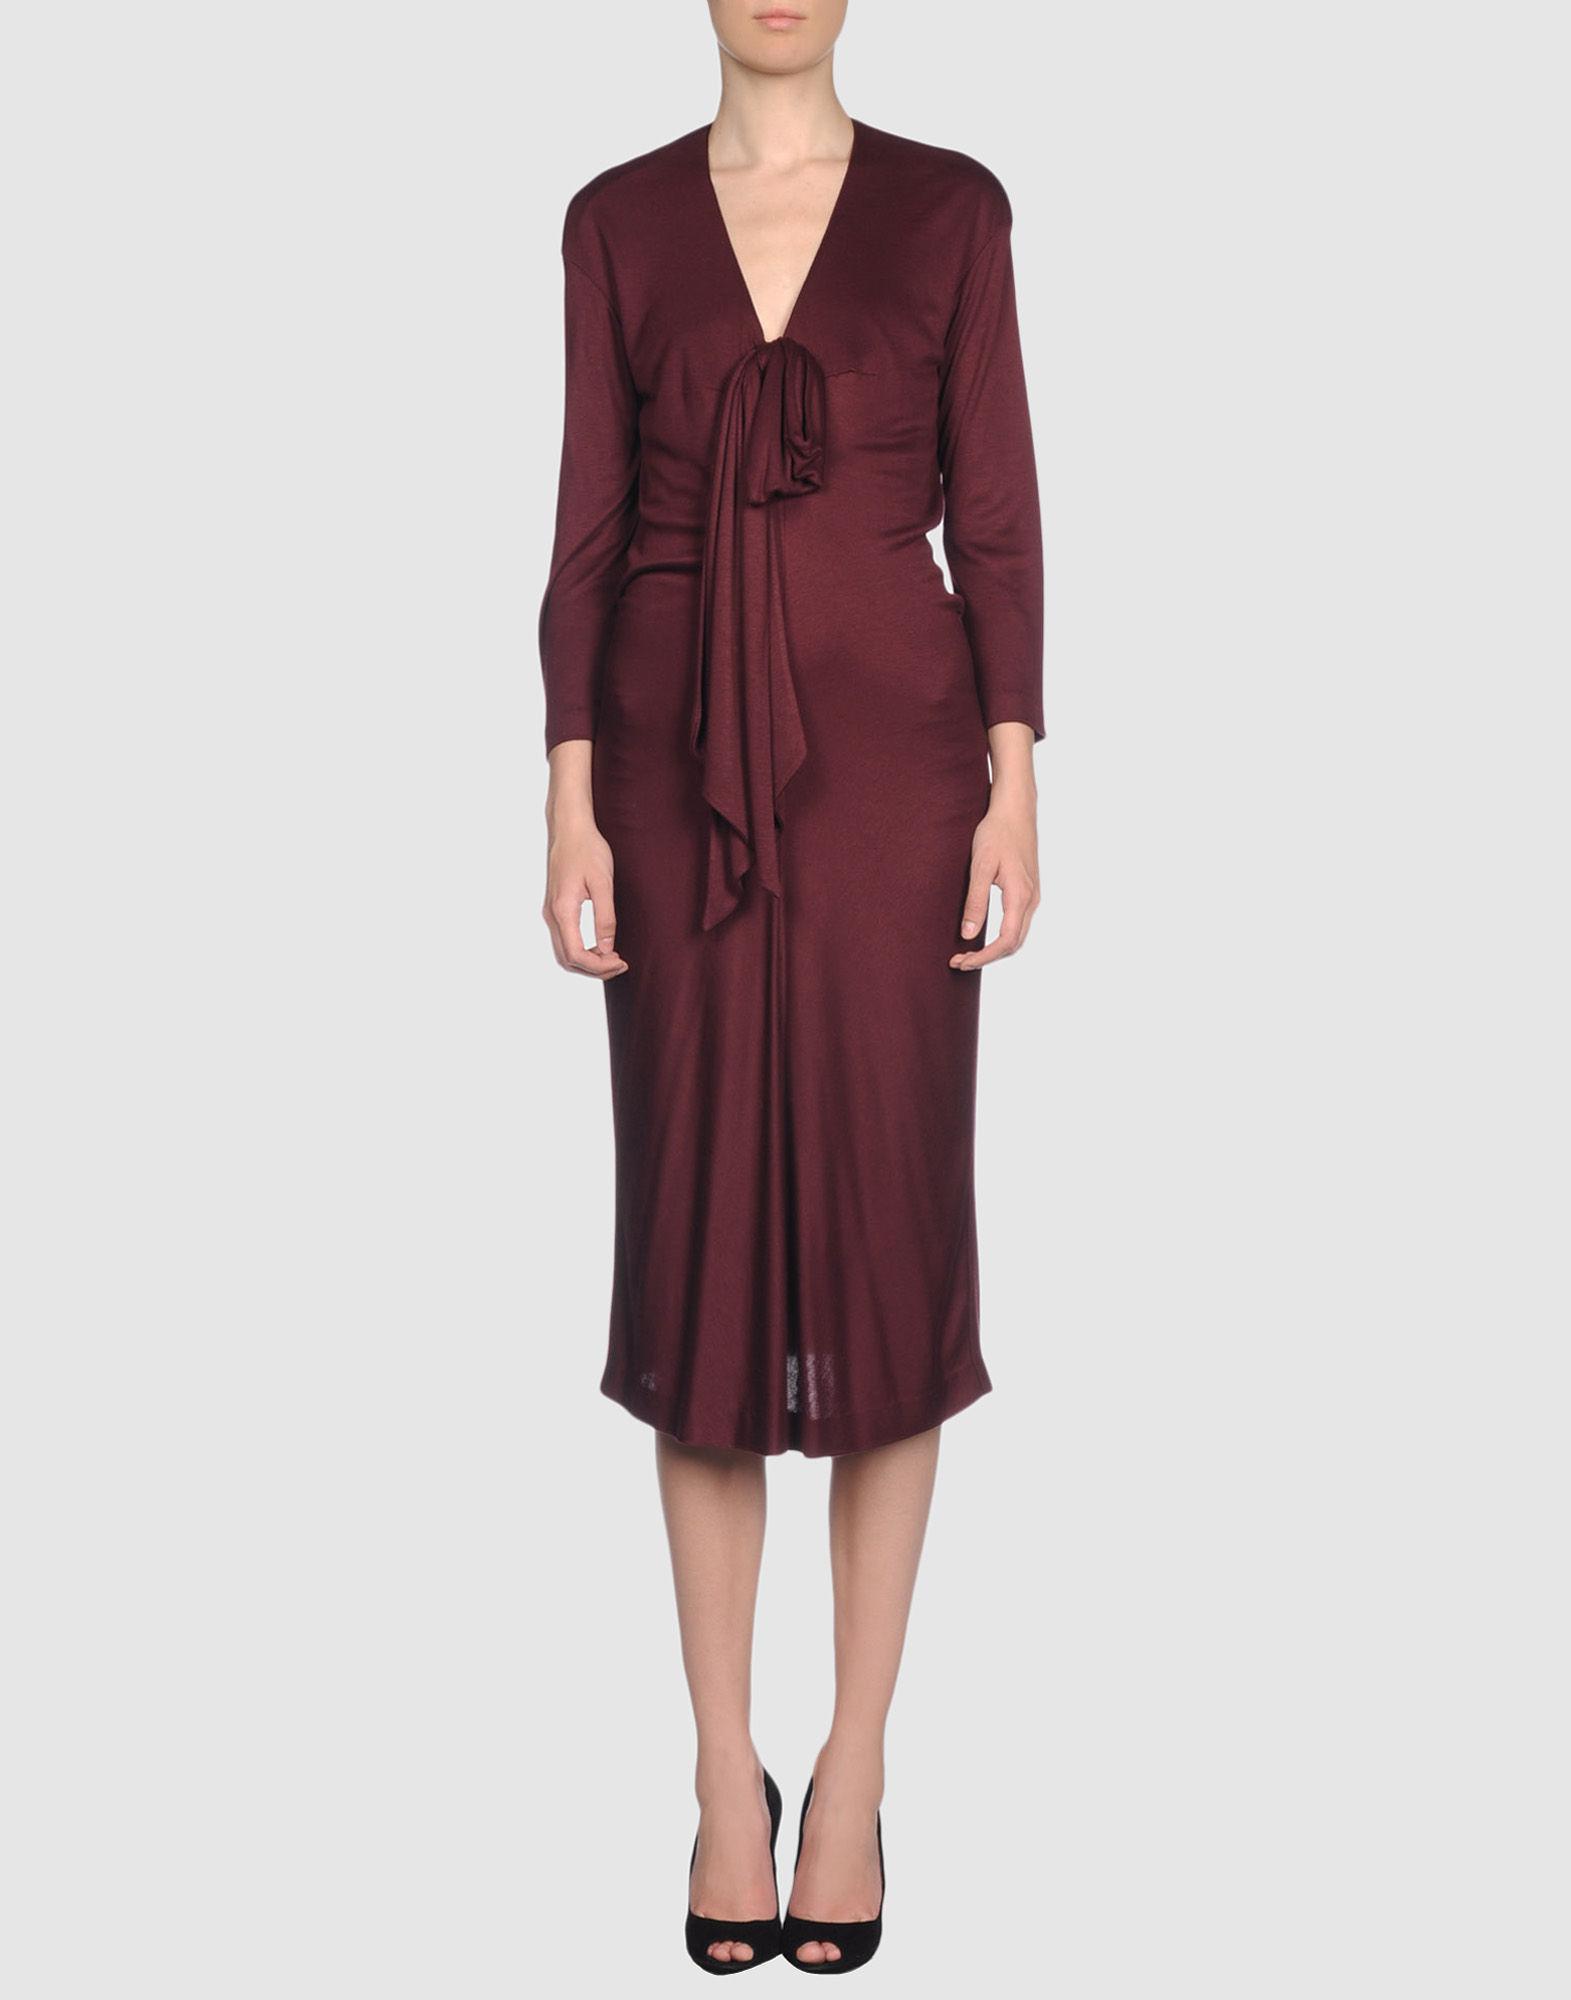 34209935IO 14 f - Βραδυνα Φορεματα Yves Saint Laurent Rive Gauche Κωδ.36